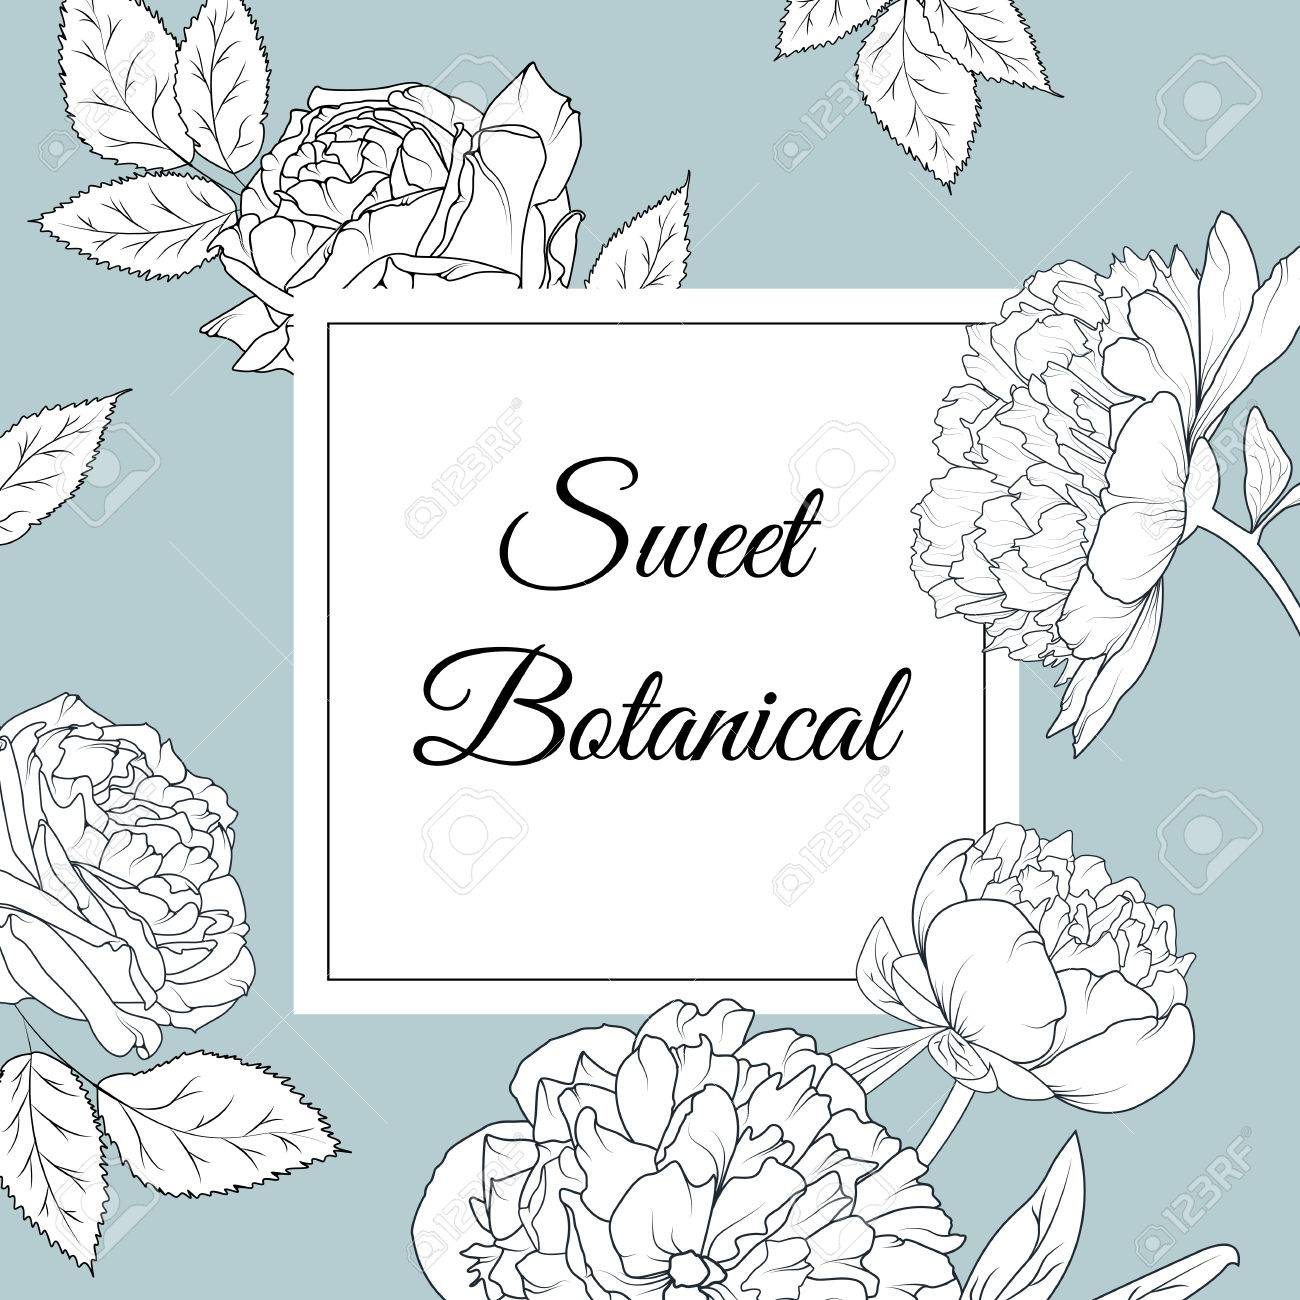 botanical peony rose flowers wedding invitation card template